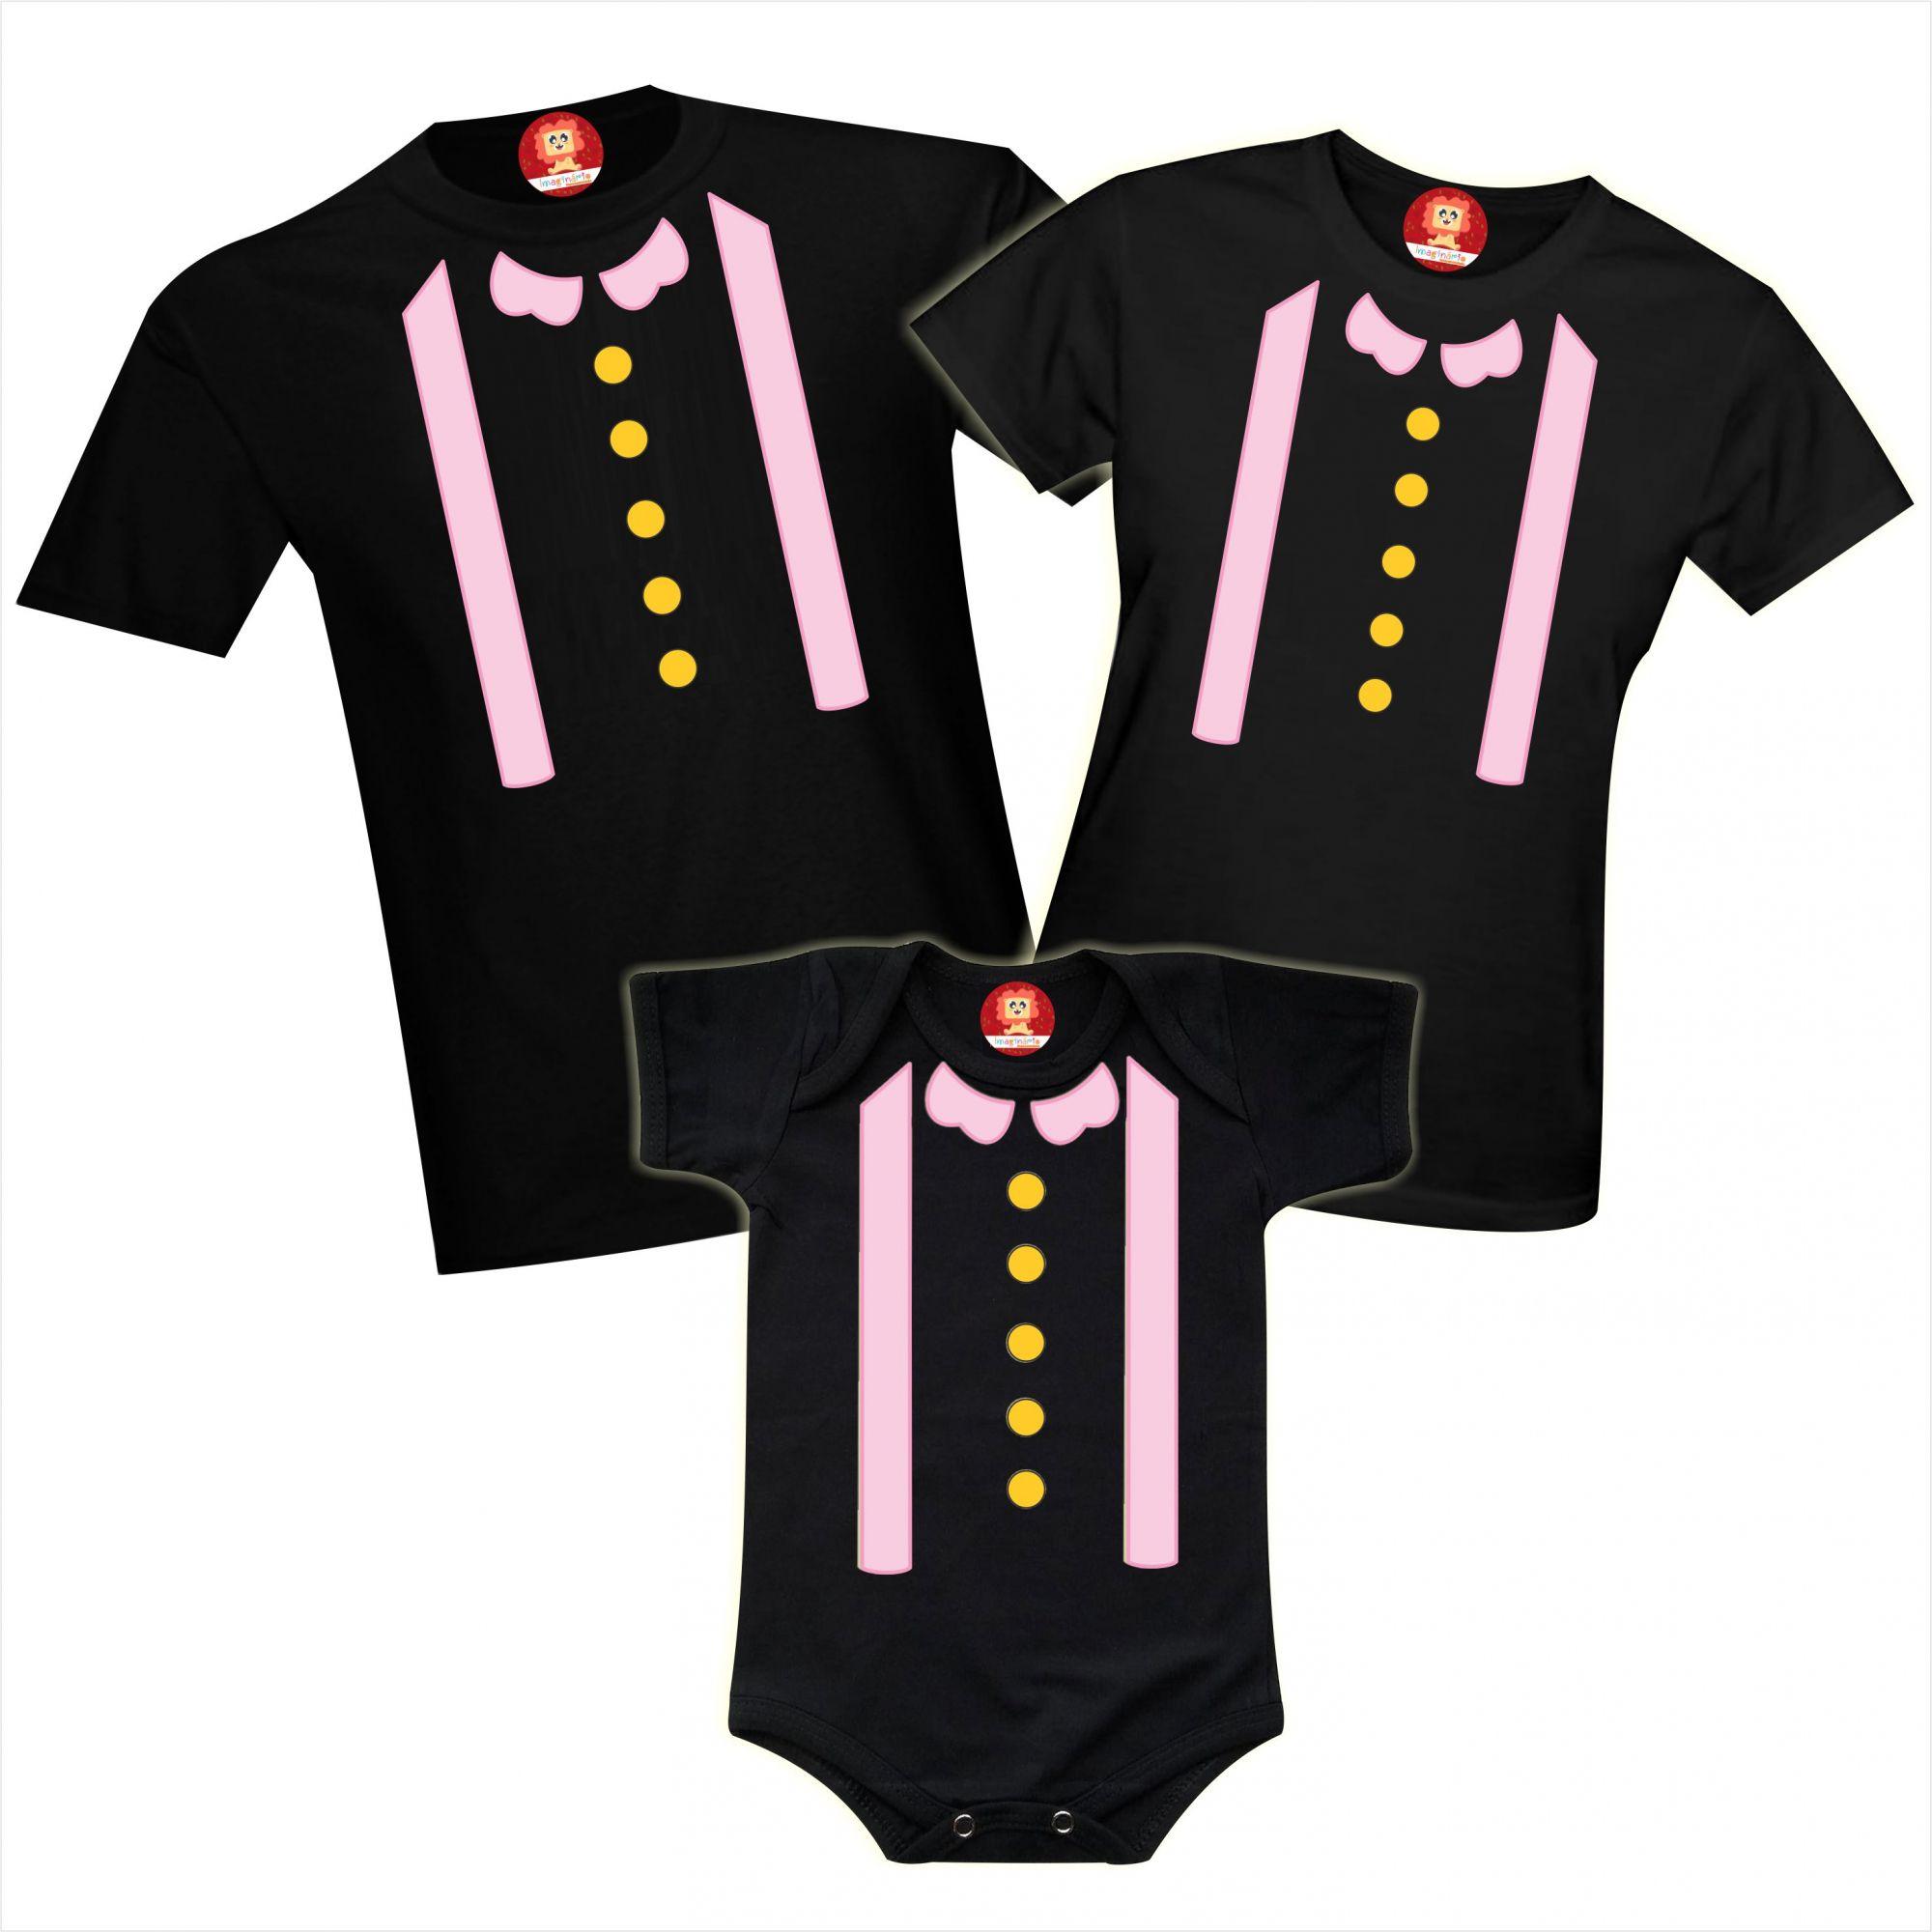 Kit Camisetas e Body de Bebê Mundo Bita Fantasia Infantil